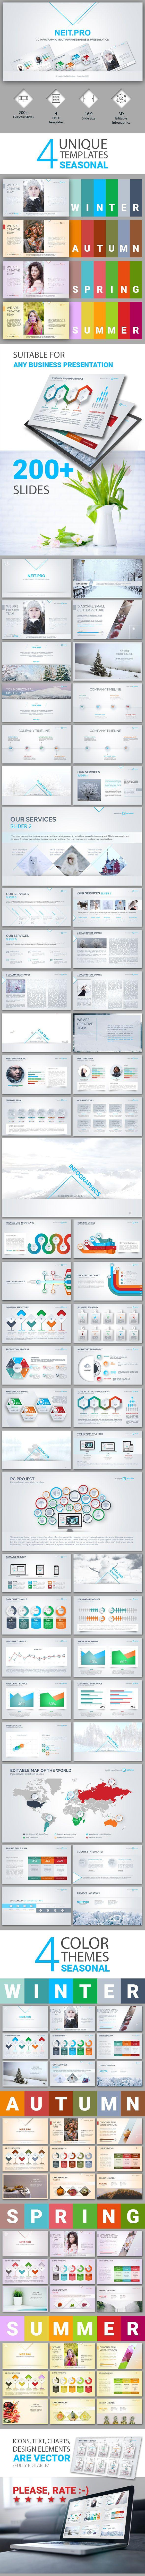 Pro 3D Infographic Multipurpose Business Presentation Template    #PowerPoint Templates Presentation Templates